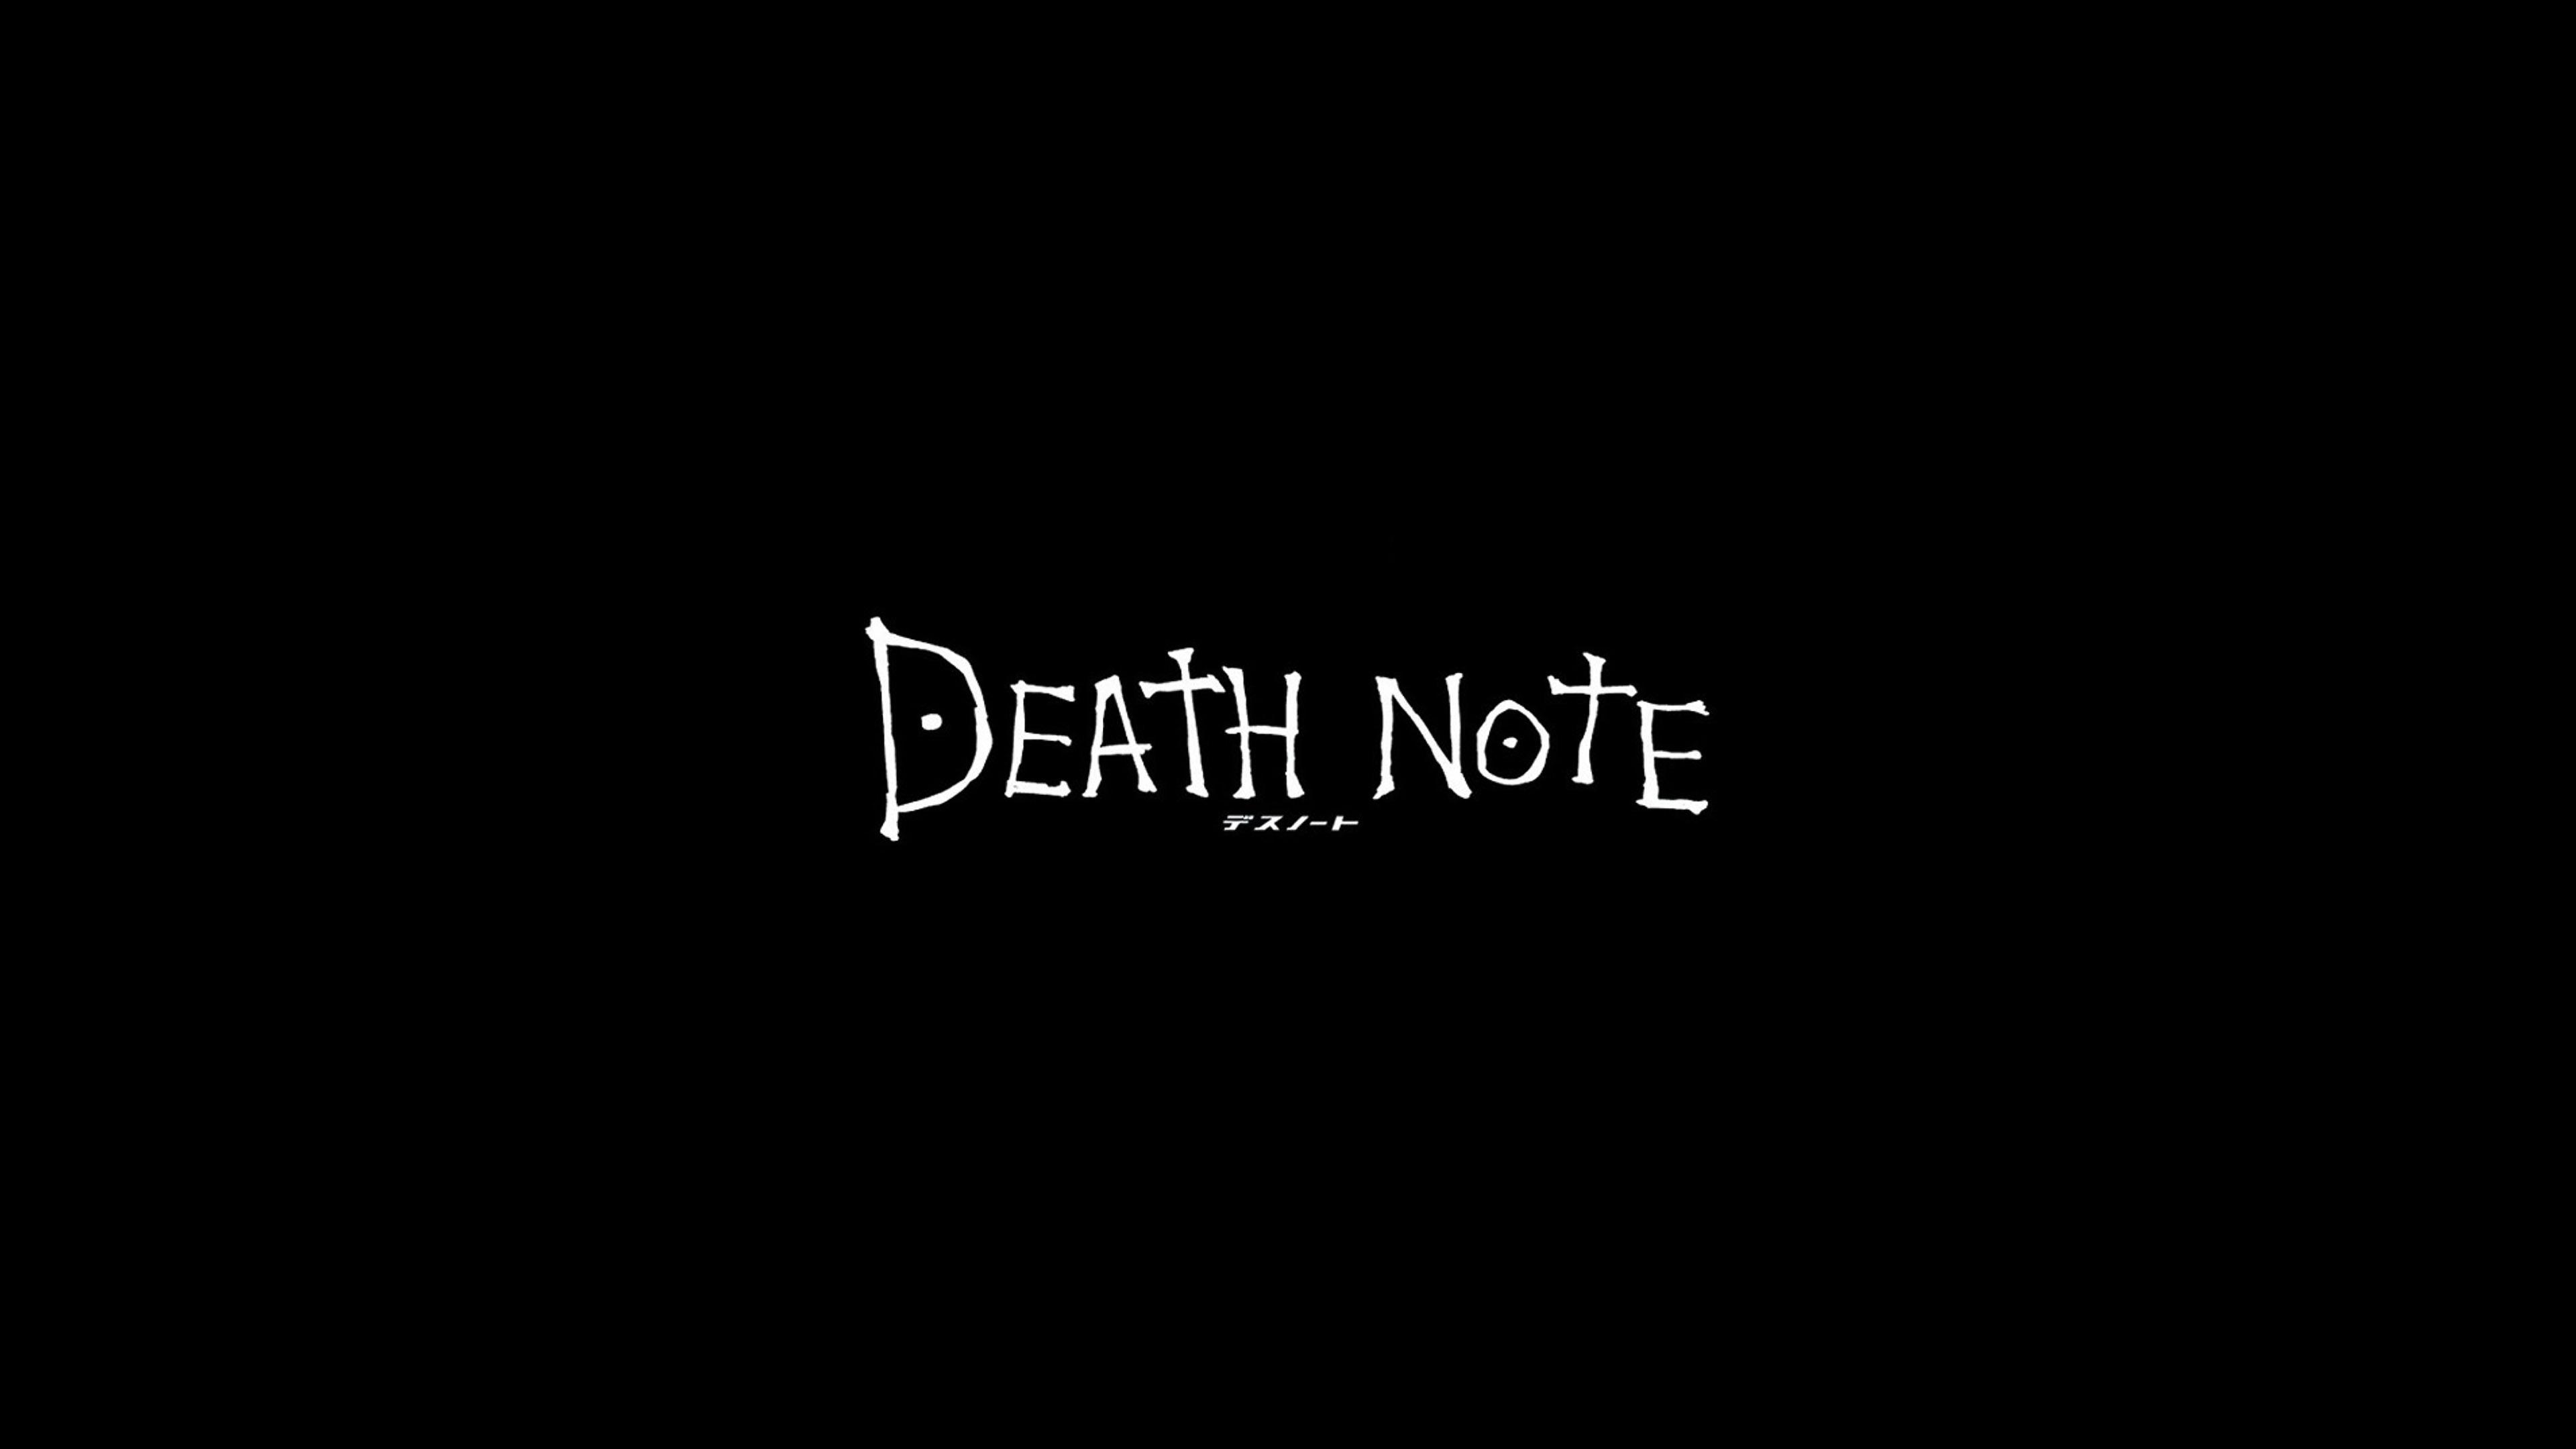 Minimalist Fall Wallpapers Ac77 Wallpaper Death Note Cartoon Illust Minimal Papers Co